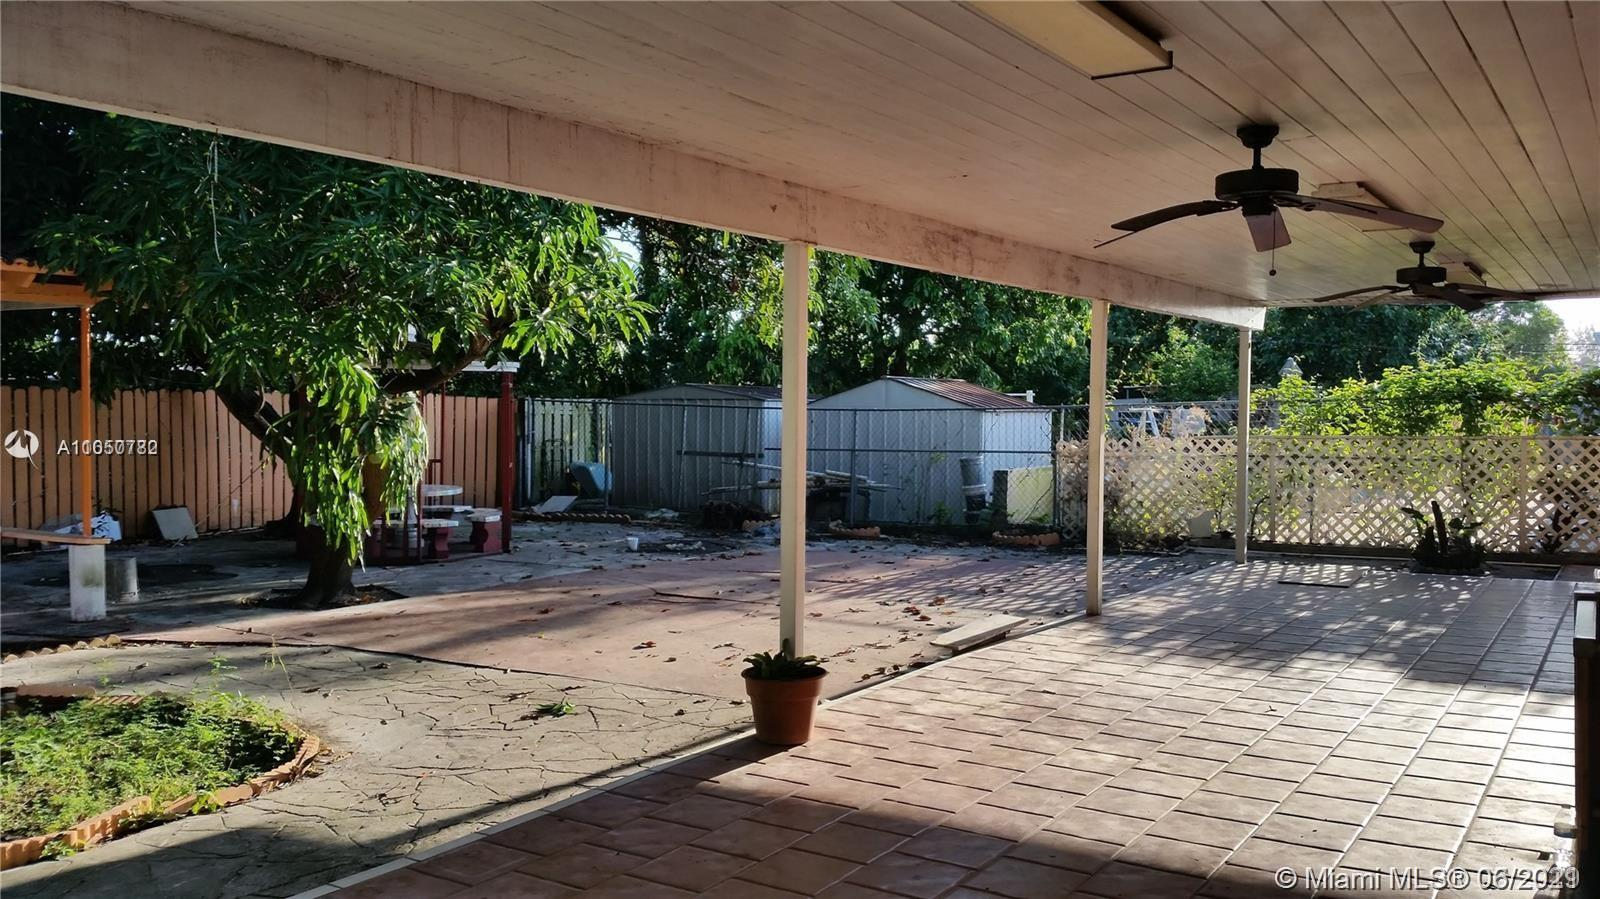 /  2468 sq. ft. $ 2021-06-02 0 Photo